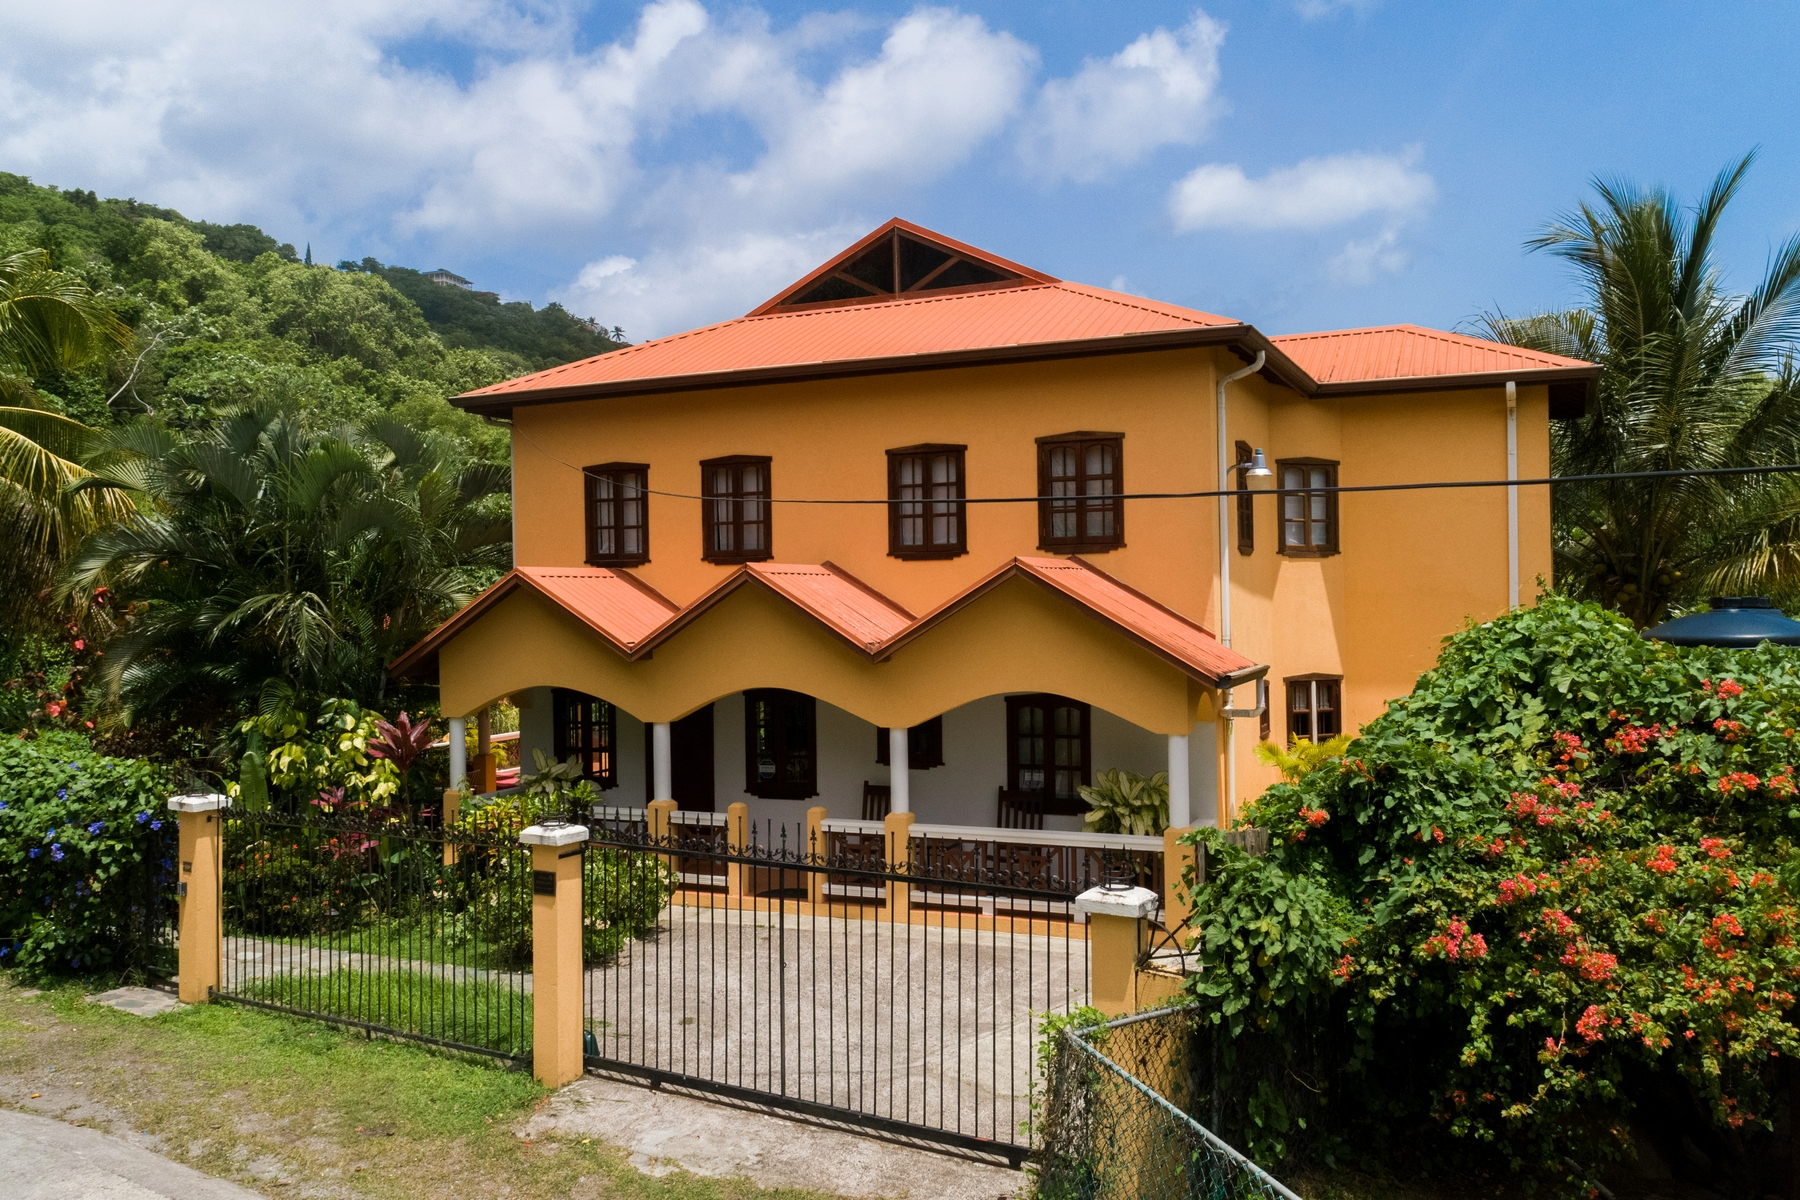 Multi-Family Homes for Sale at Villa Papillon Marigot Bay, Castries St. Lucia